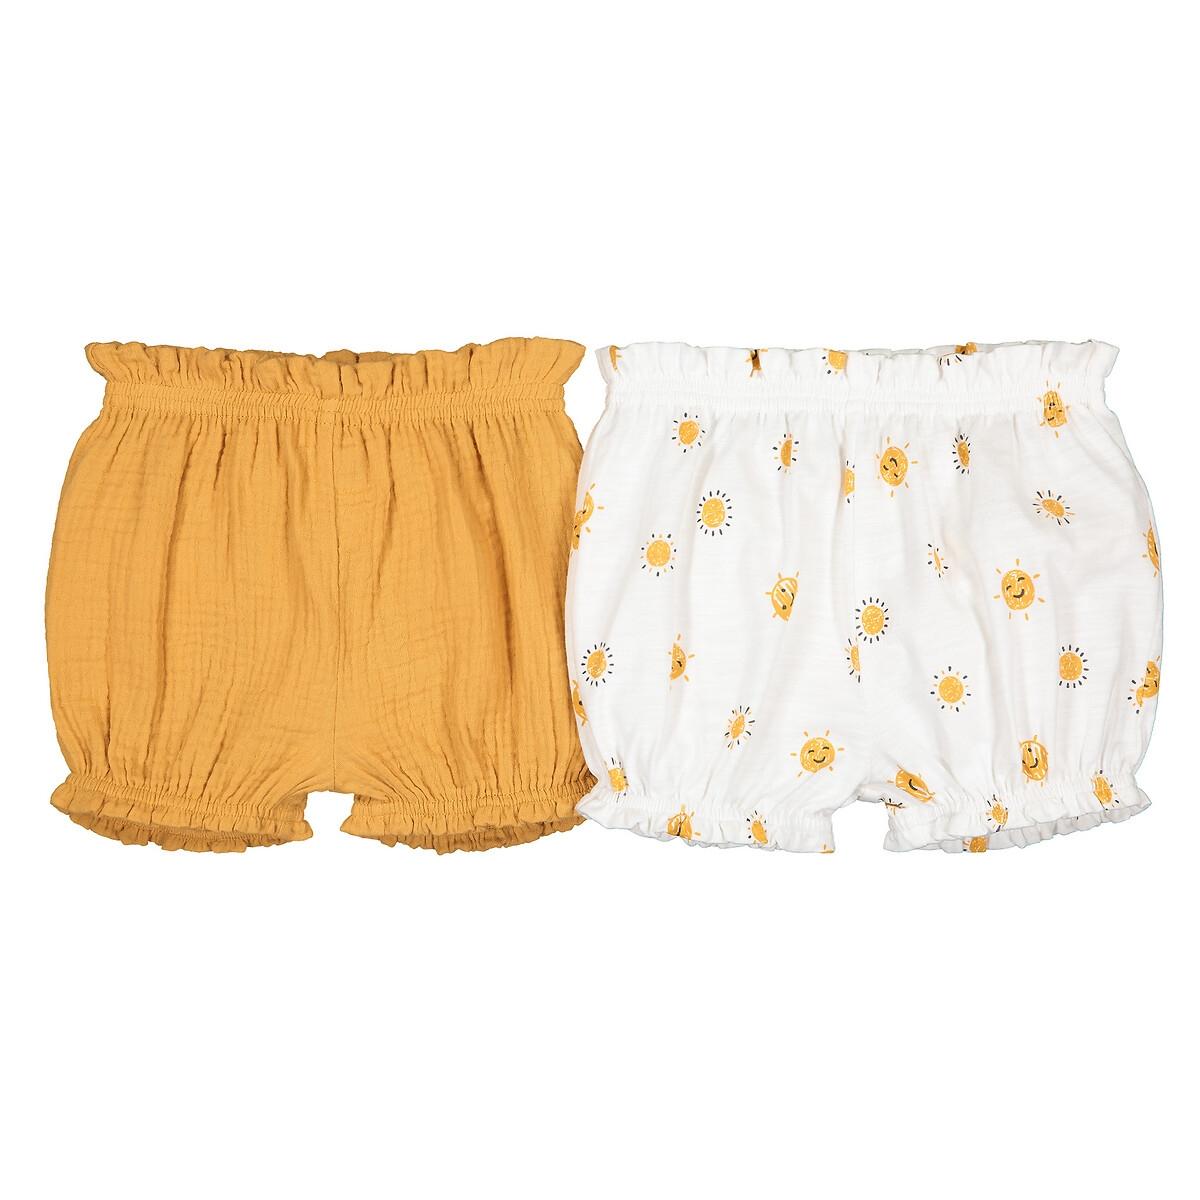 Комплект из 2 шортов 1 LaRedoute Мес - 3 года 9 мес. - 71 см желтый брюки laredoute из мольтона с бантом 1 мес 3 года 9 мес 71 см розовый